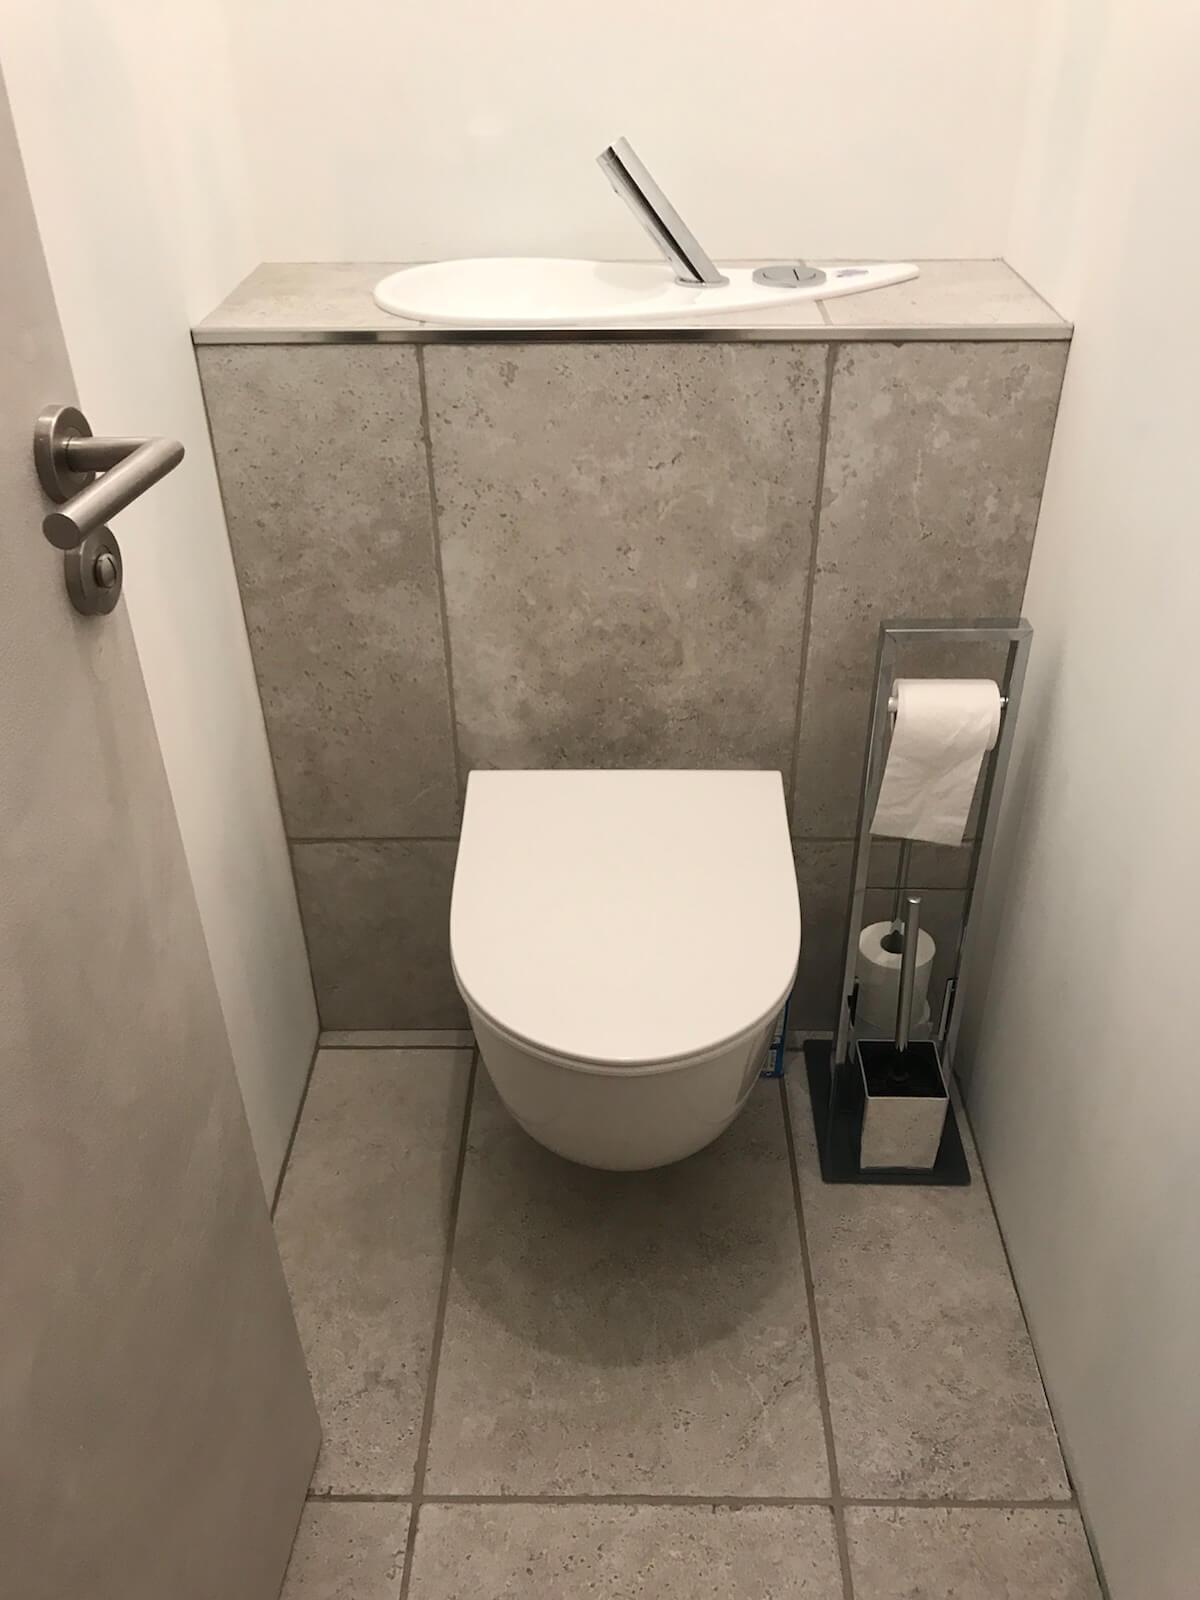 Raccordement Wc Suspendu Geberit wc suspendu geberit avec lave-mains design intégré   wici